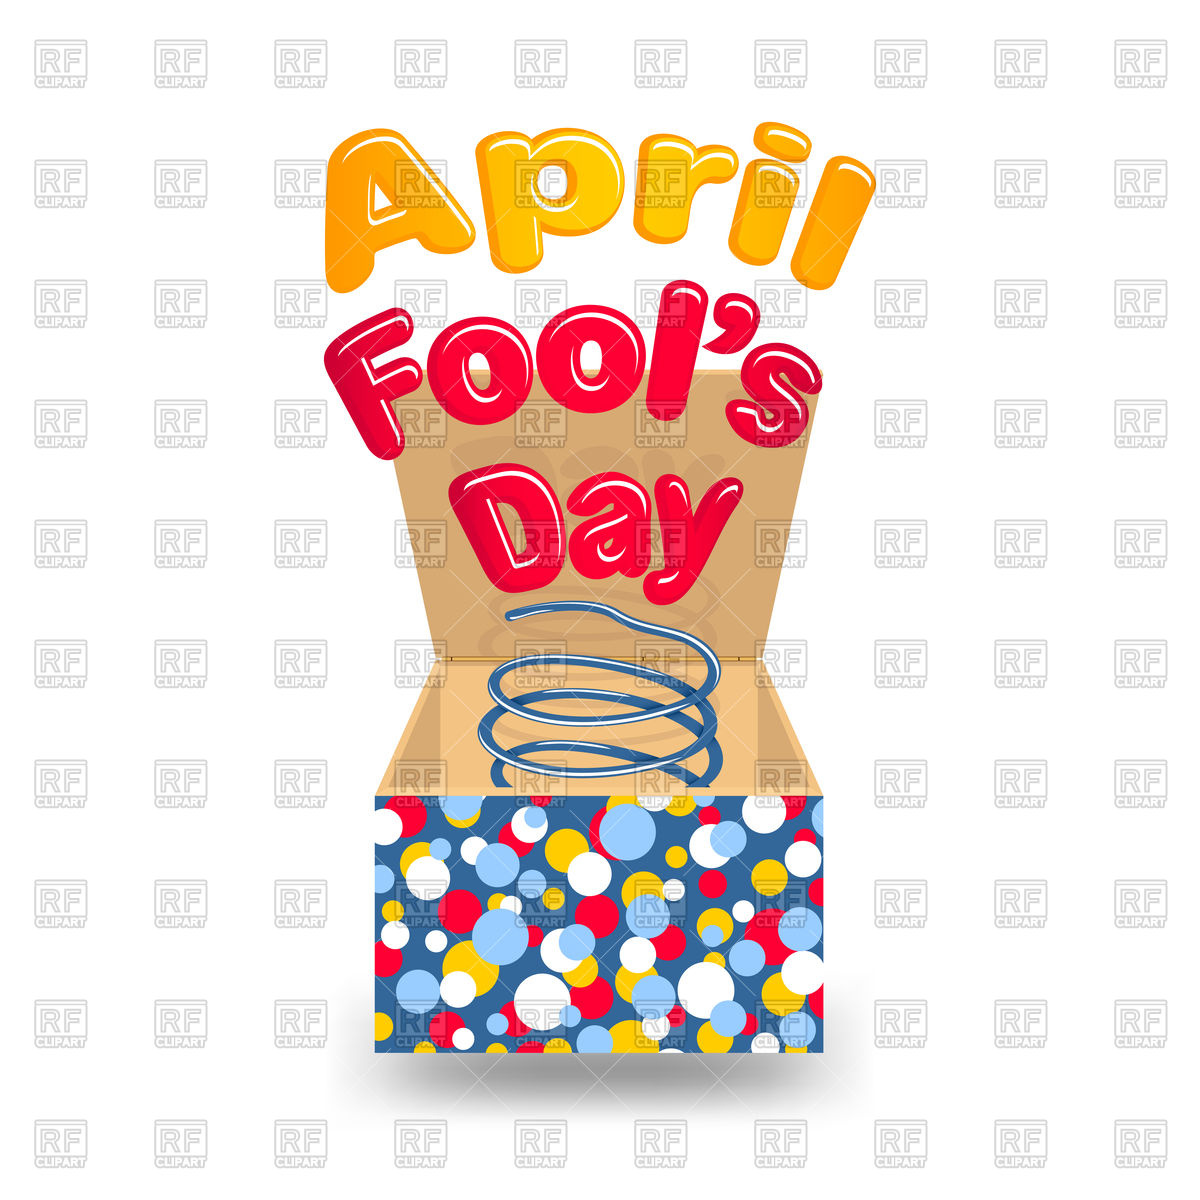 1200x1200 April Fool's Day Box Royalty Free Vector Clip Art Image